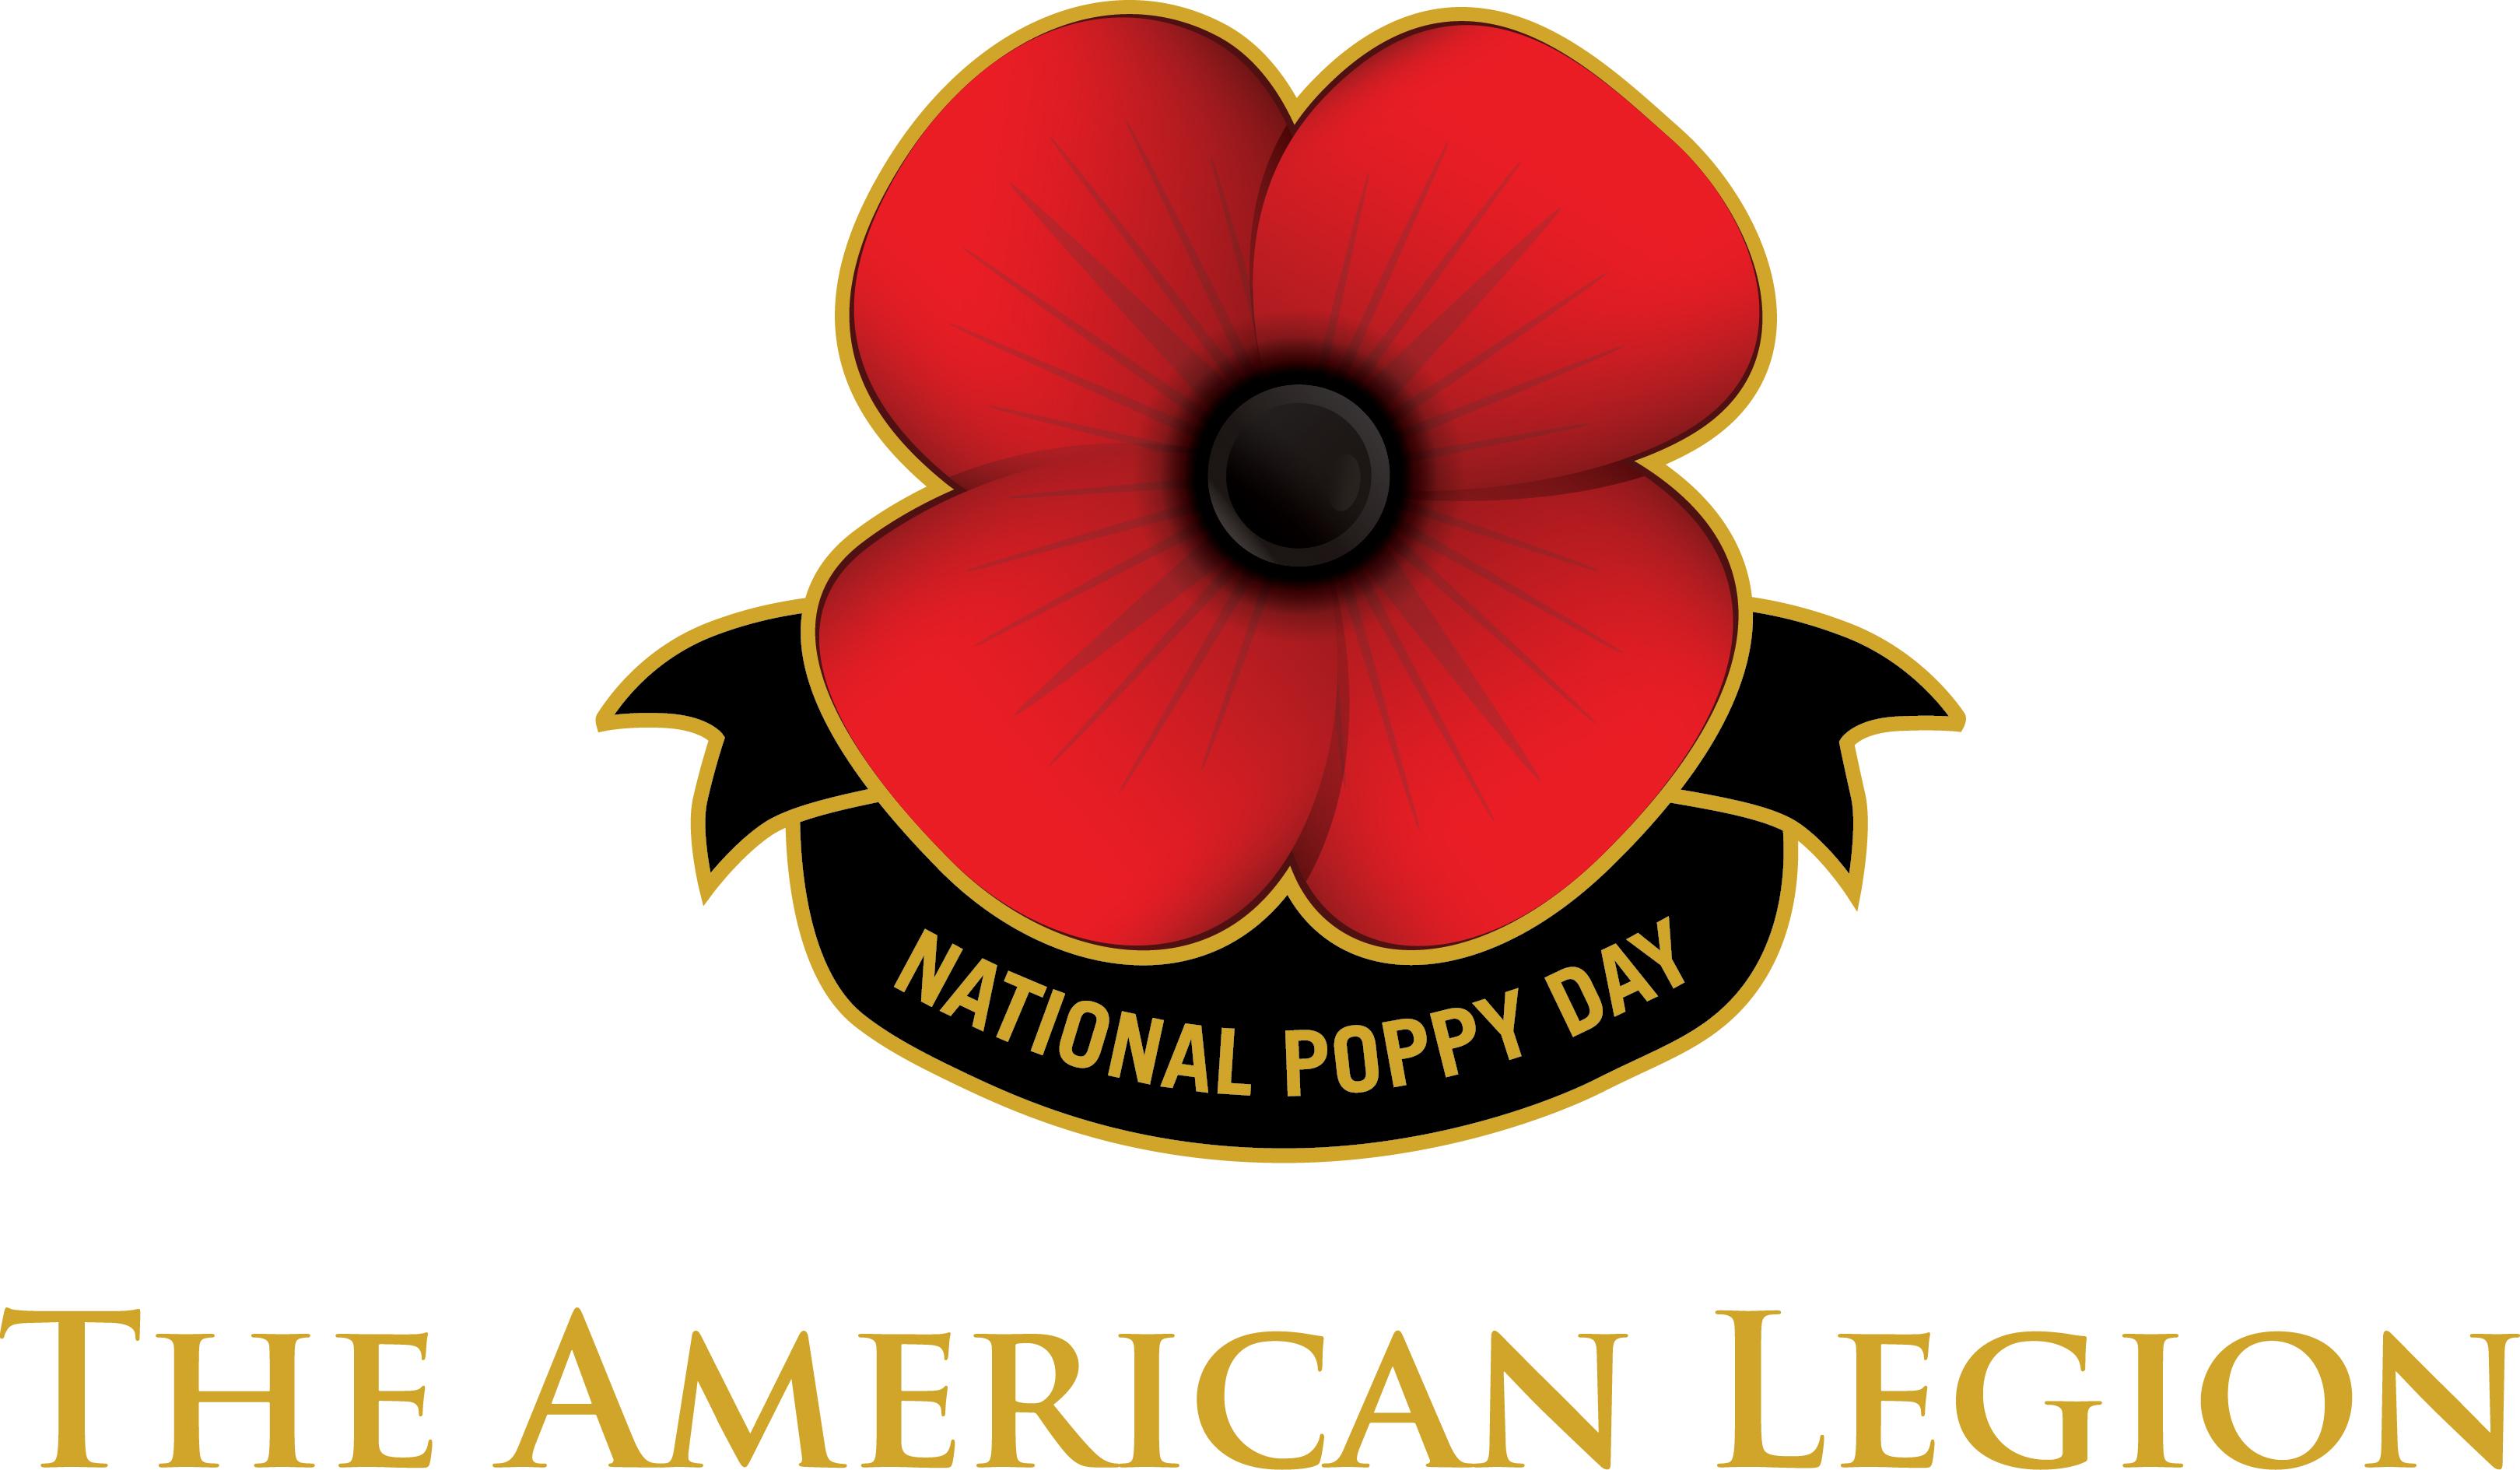 Poppy Day Logos The American Legion